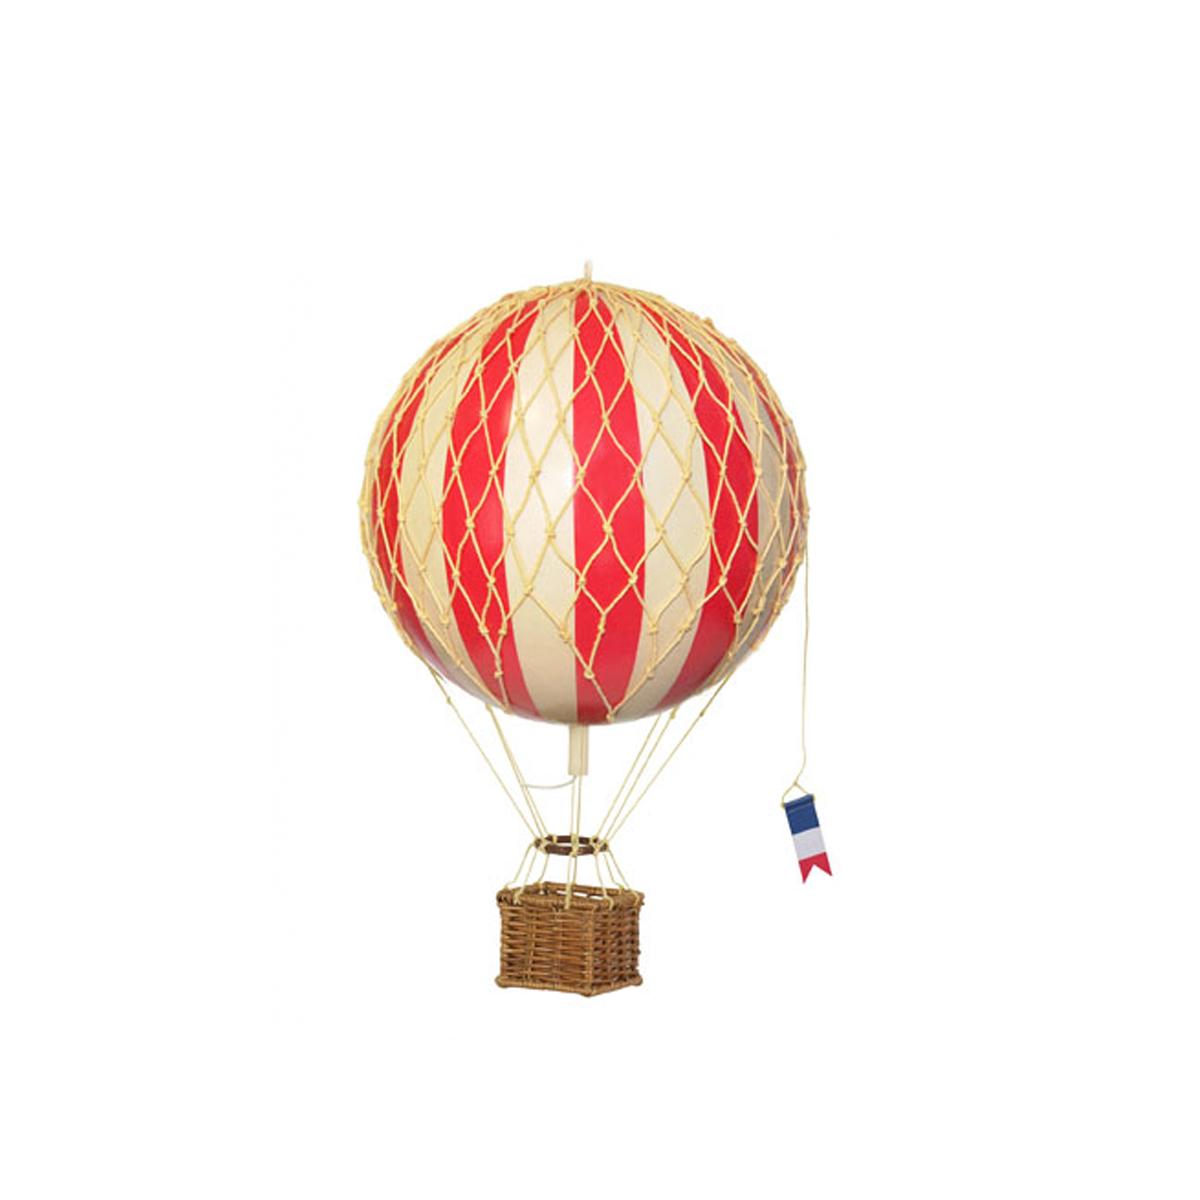 Image of Authentic Models luftballon 8,5 cm - rød